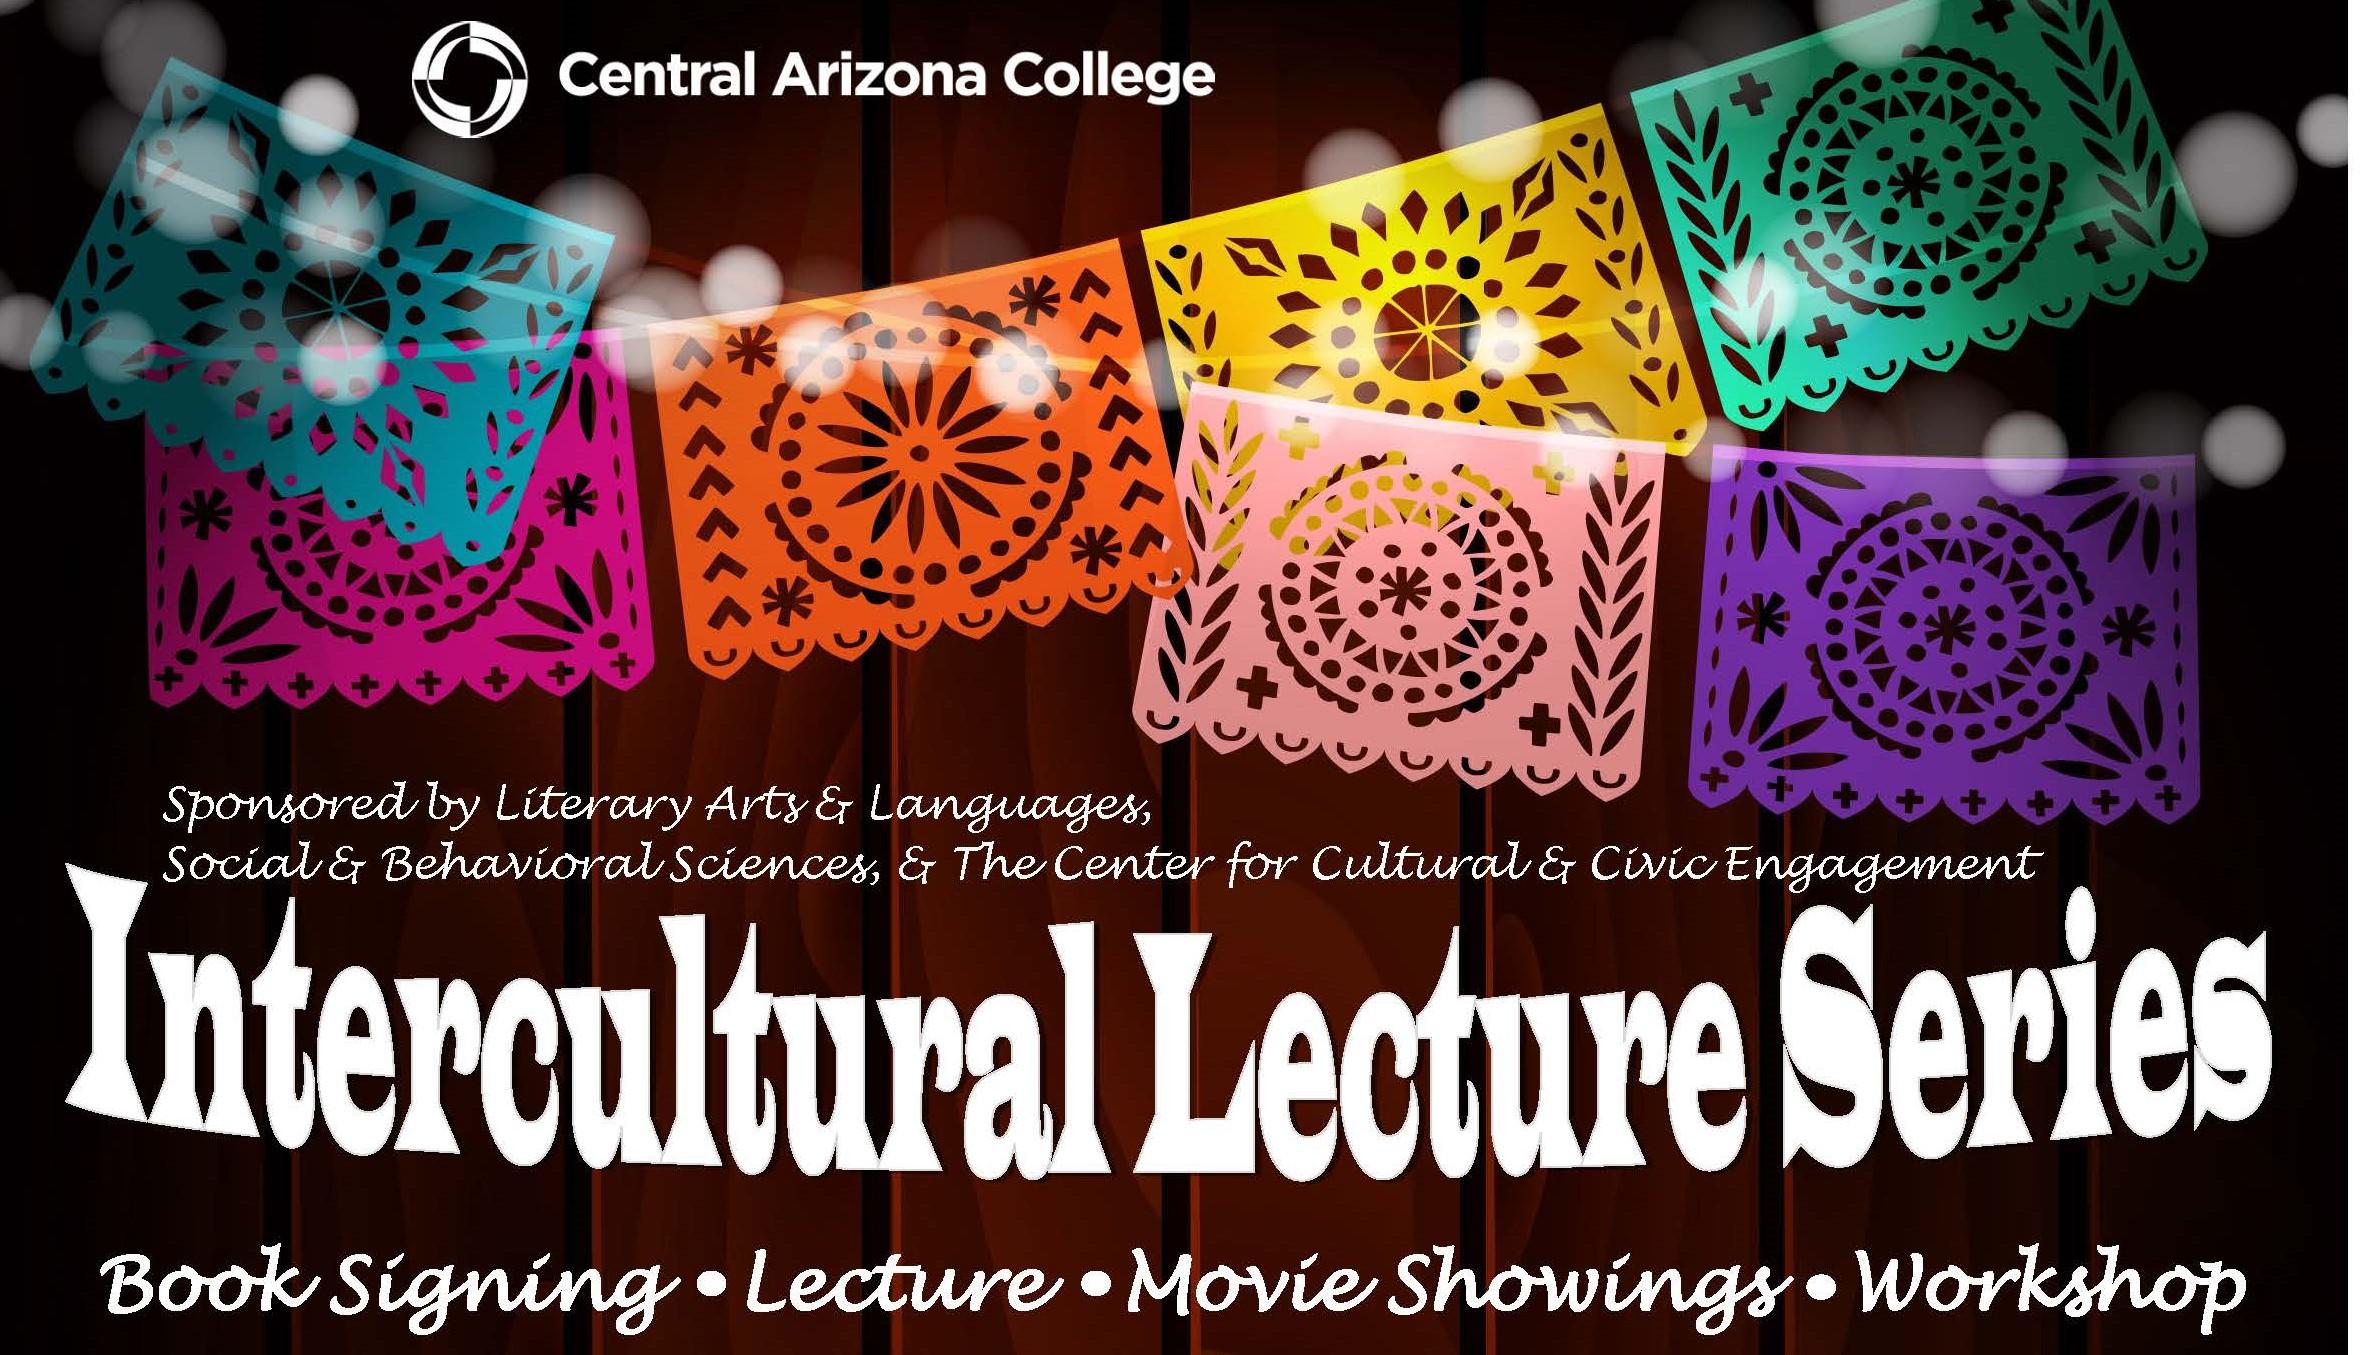 Intercultural Lecture Series Header Design